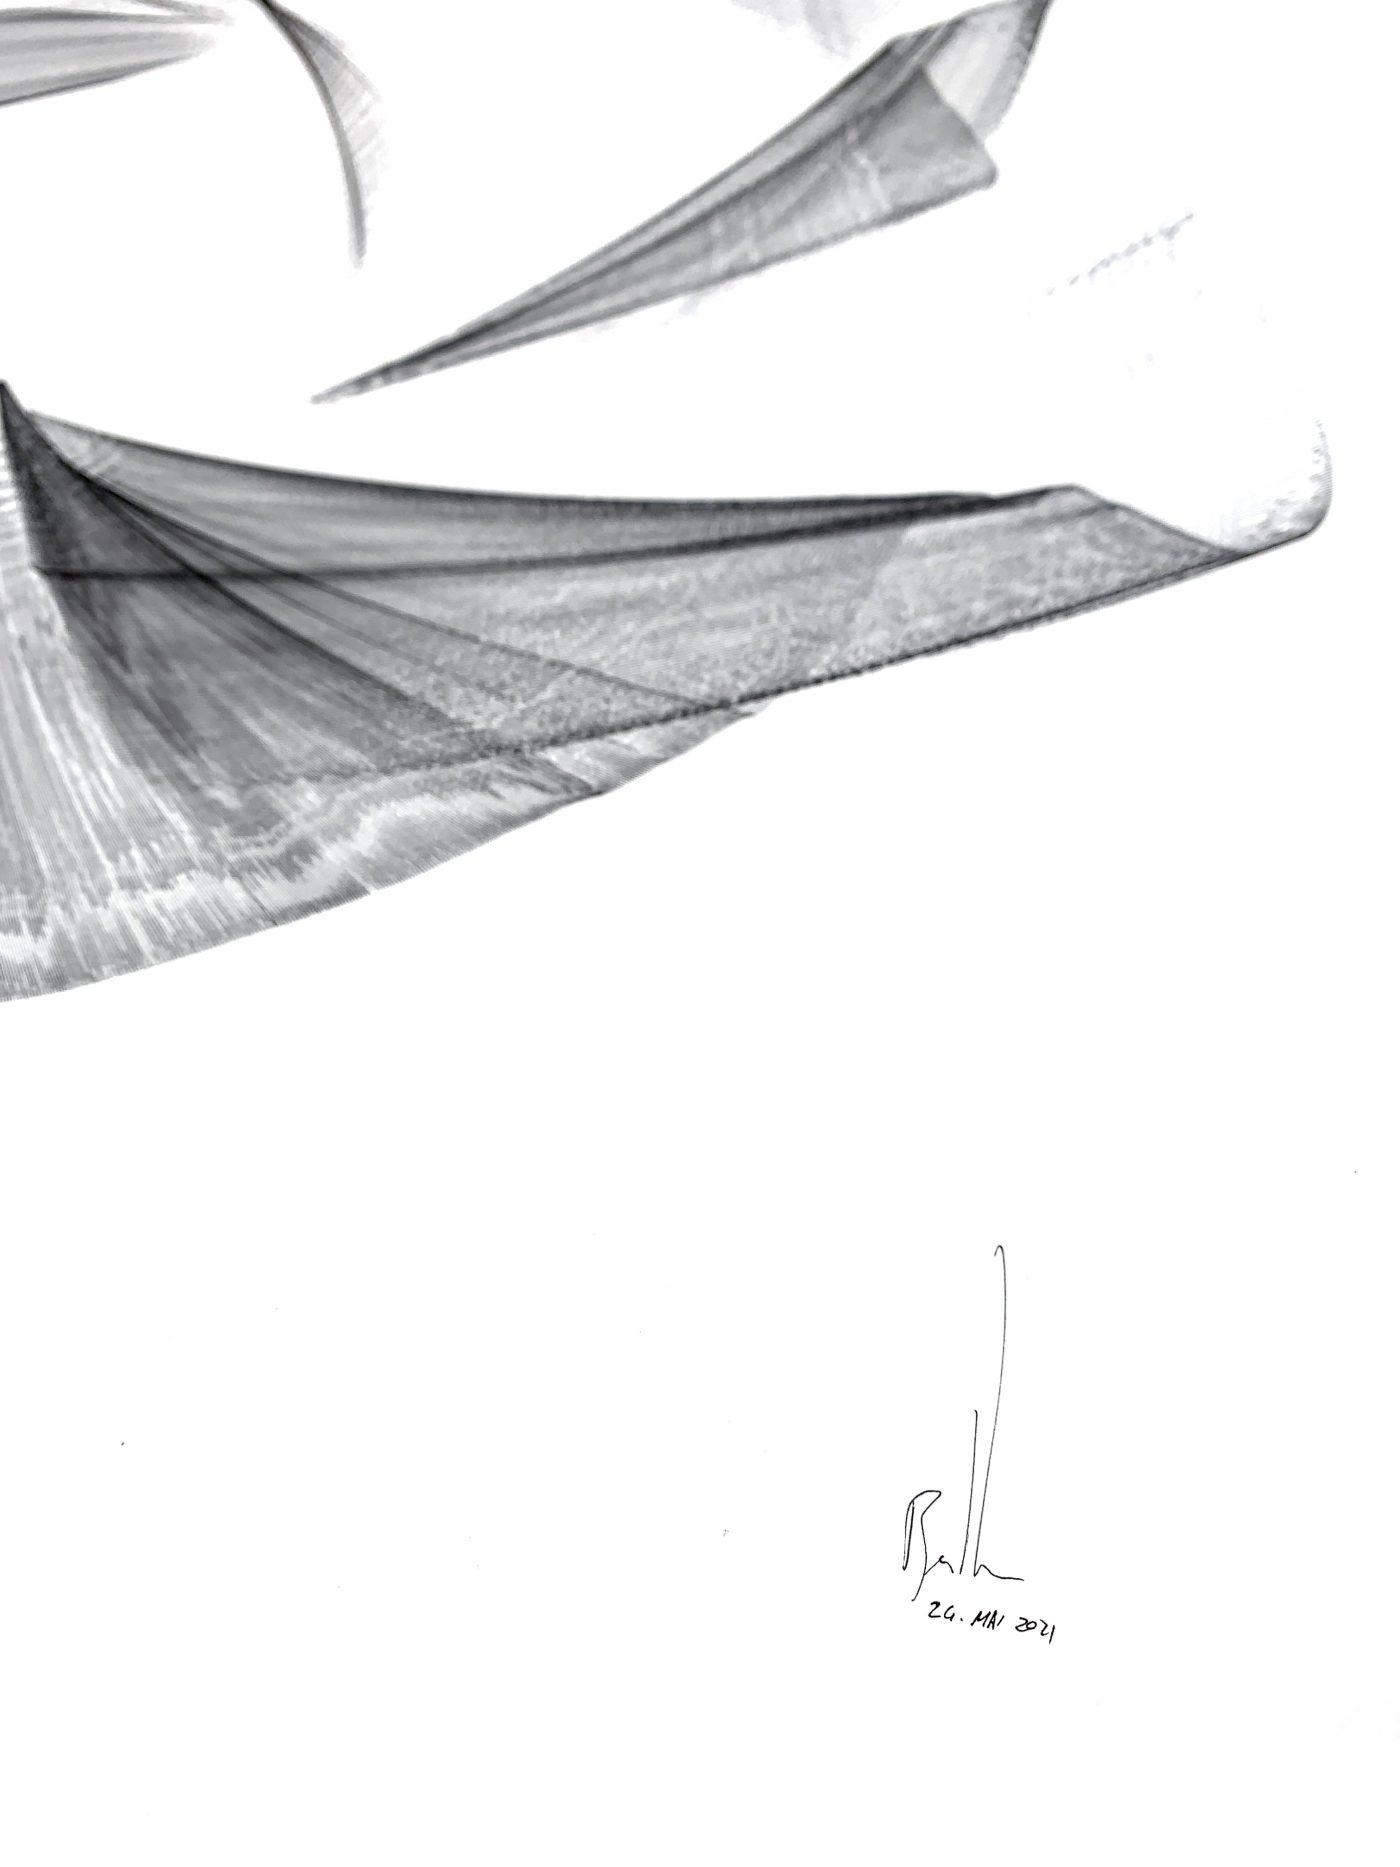 x510 - 24 Mai 2021